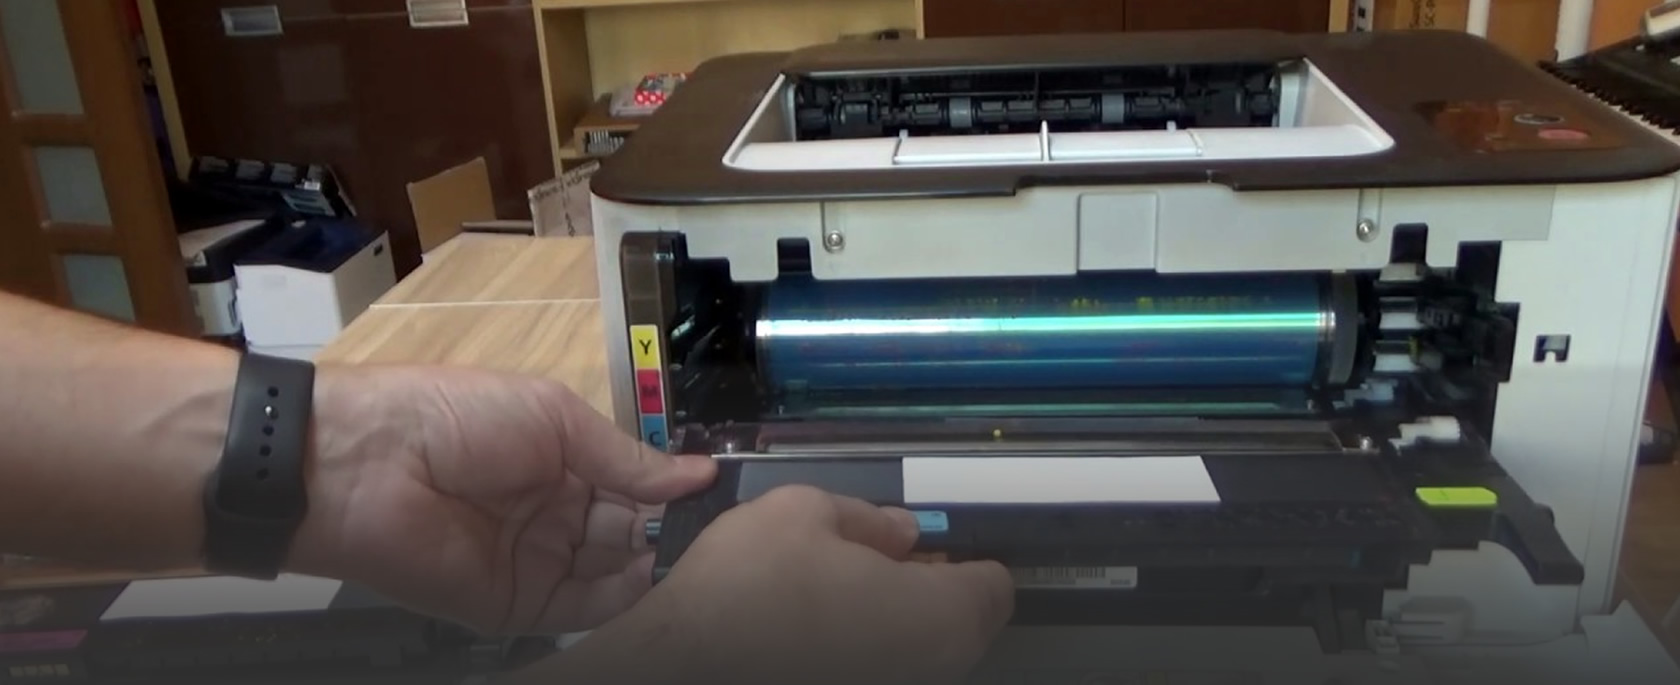 Прошивка и заправка HP LJ 107, MFP 135, MFP 13, Color Laser 150a, Color Laser 178/179